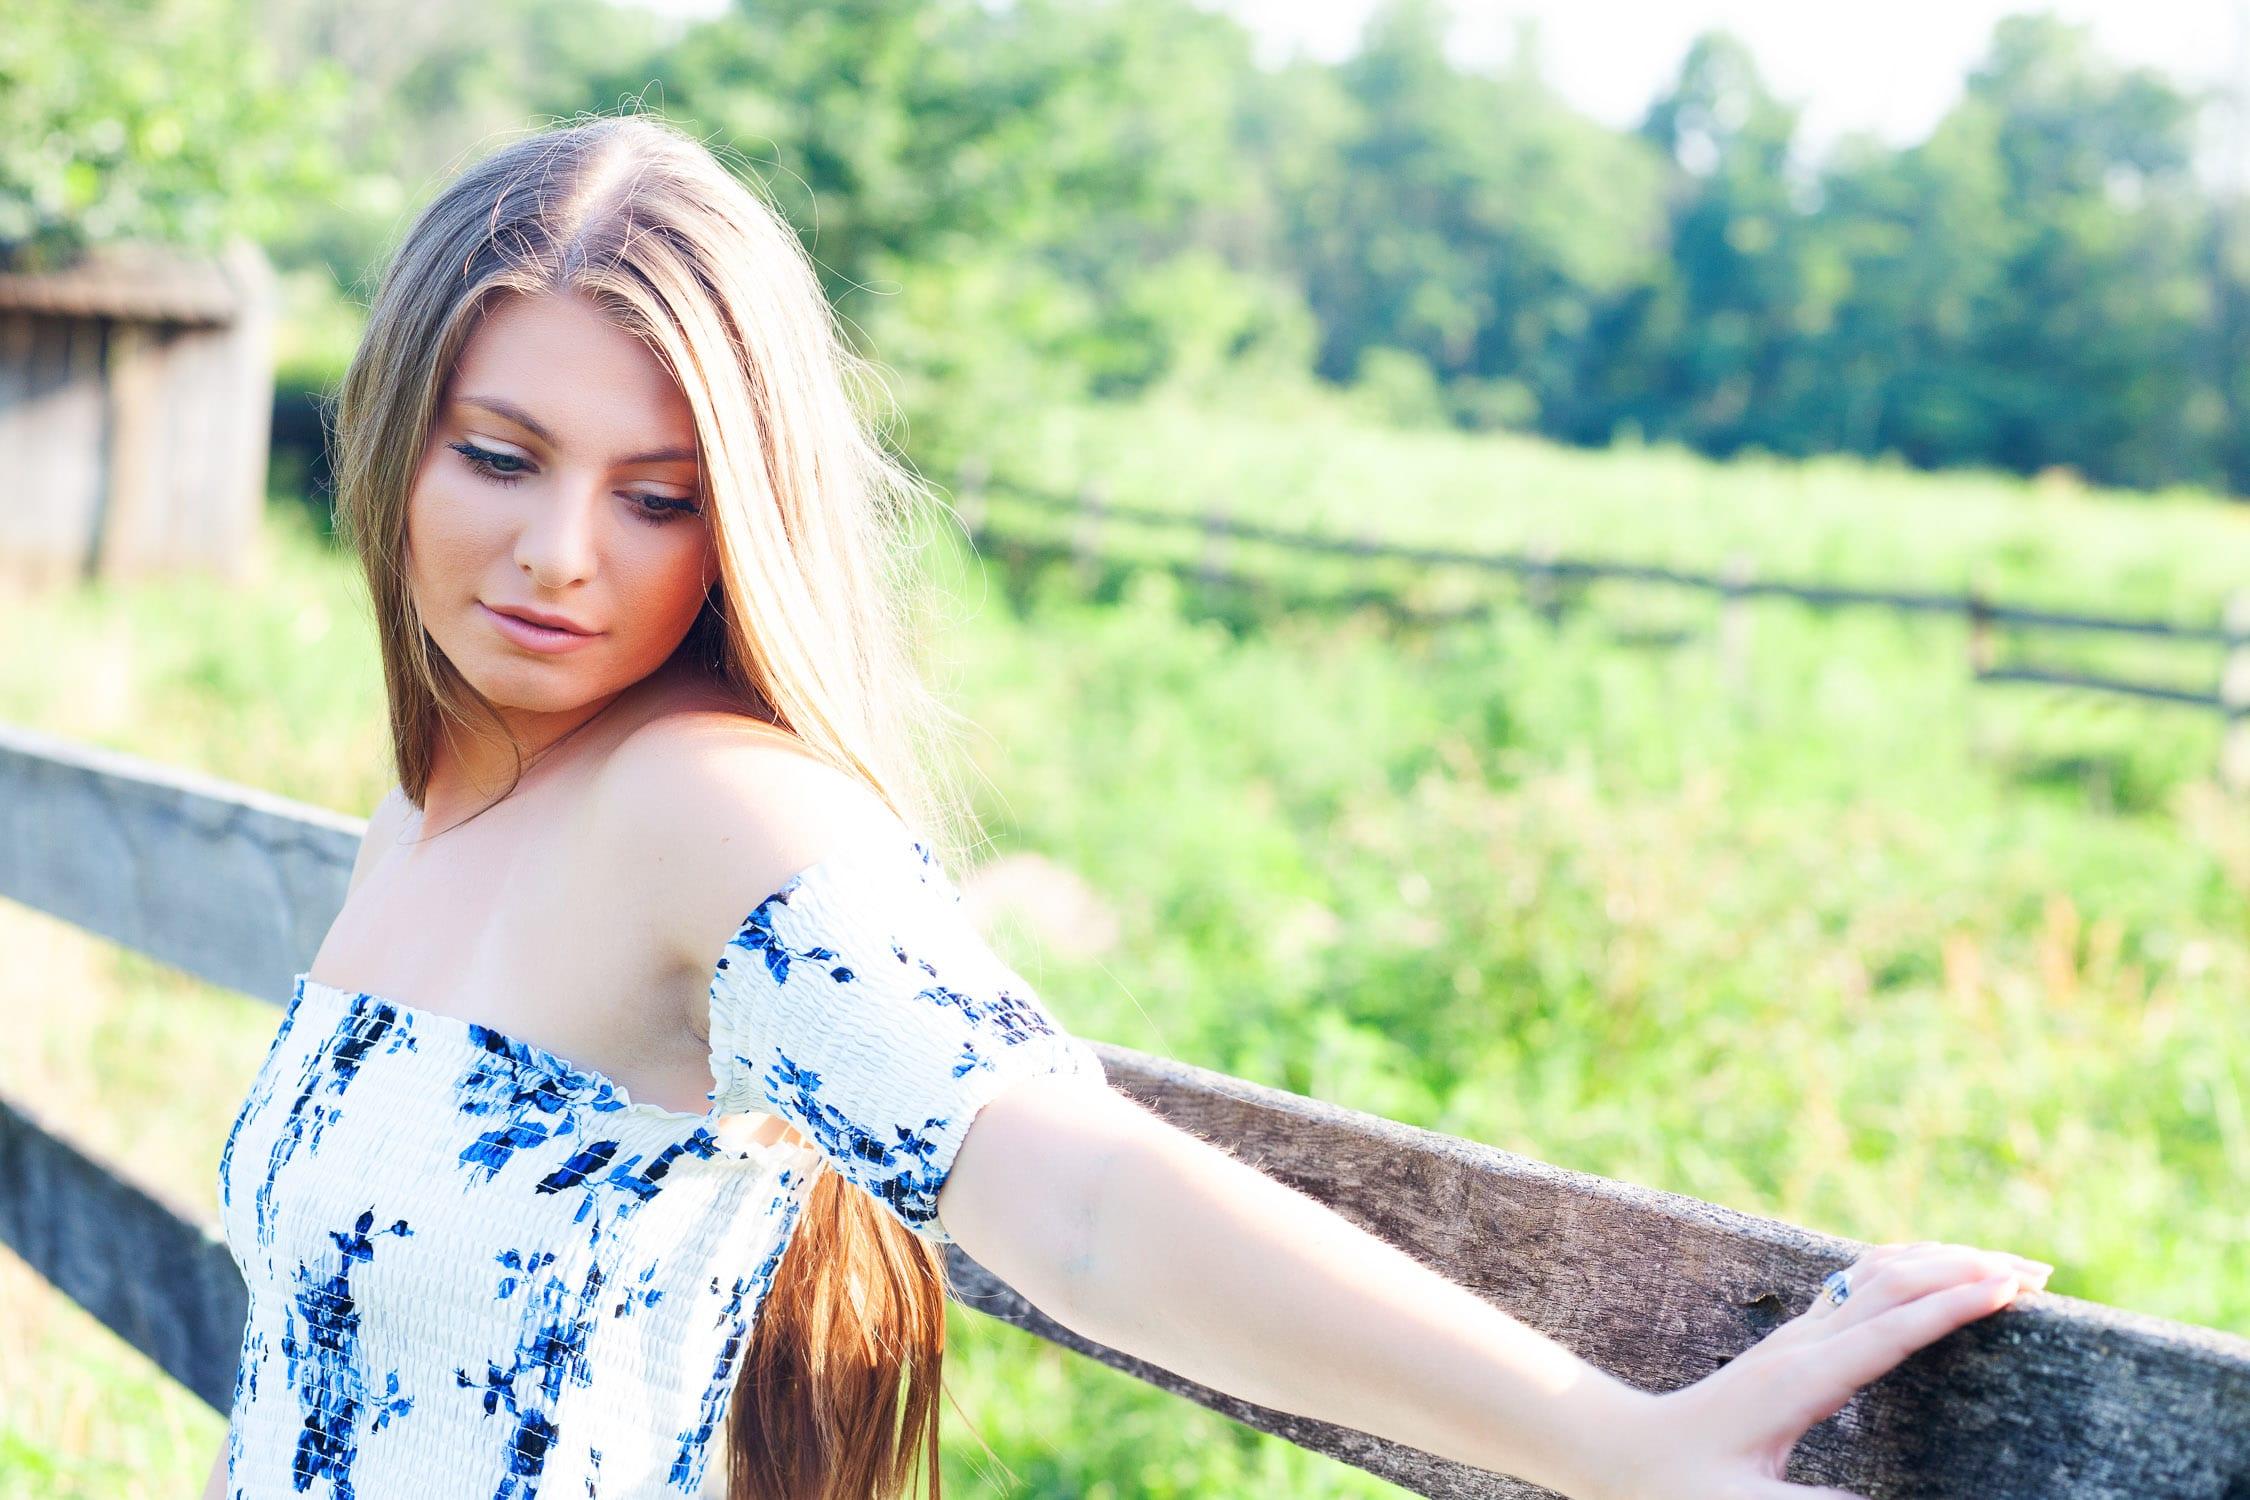 louisville senior girl at blackacre farm leaning against wooden fence